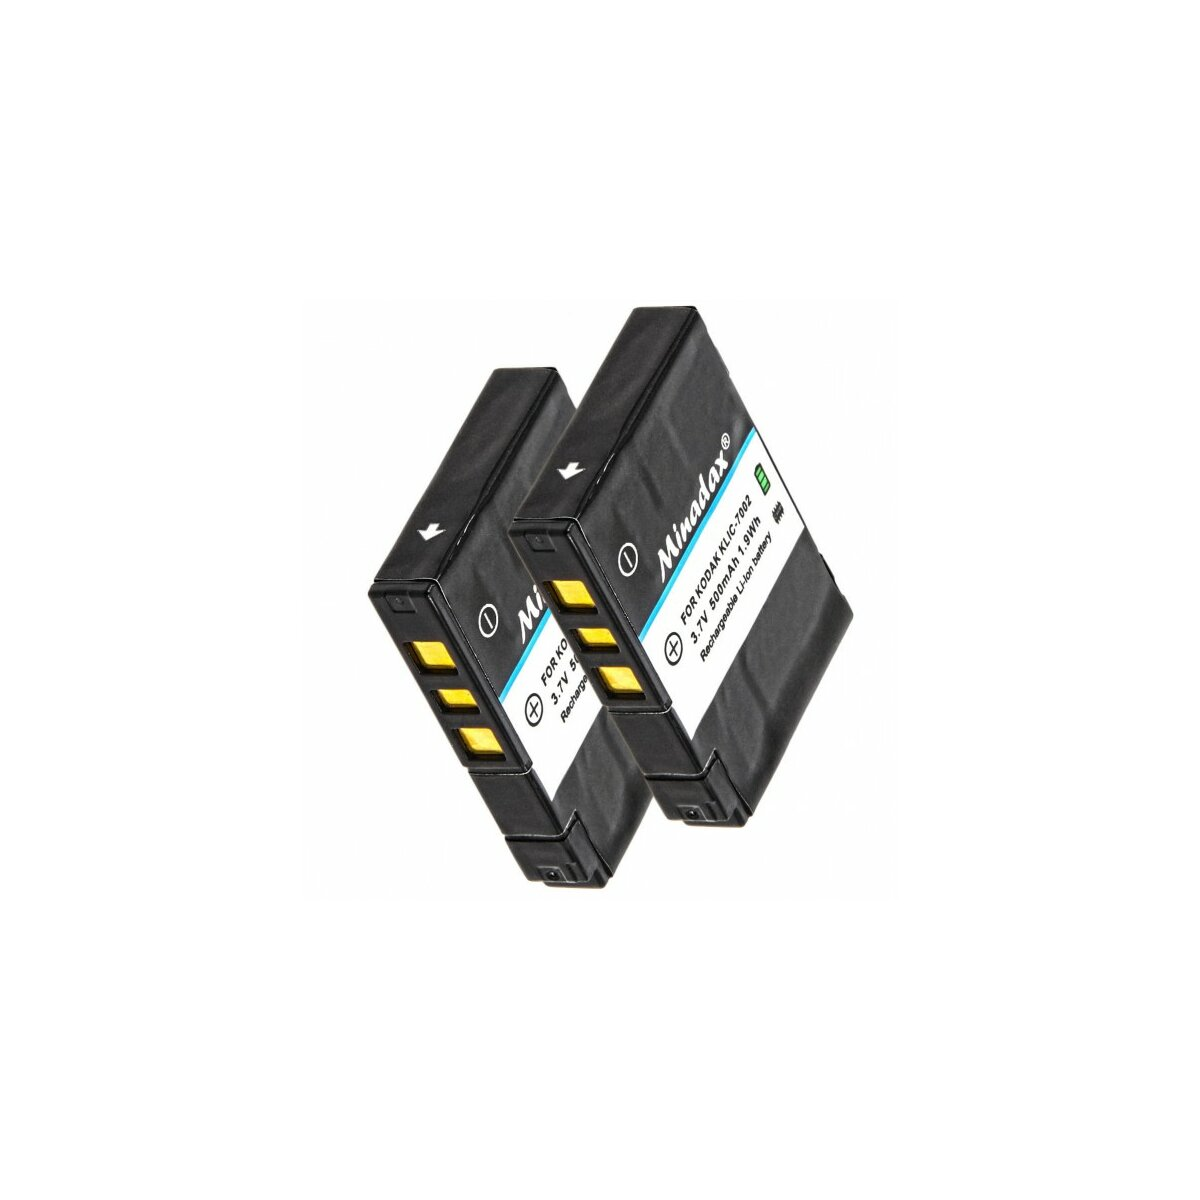 2 x Minadax® Qualitaetsakku mit echten 500 mAh fuer Kodak EasyShare V530 V603, wie KLIC-7002 - Intelligentes Akkusystem mit Chip